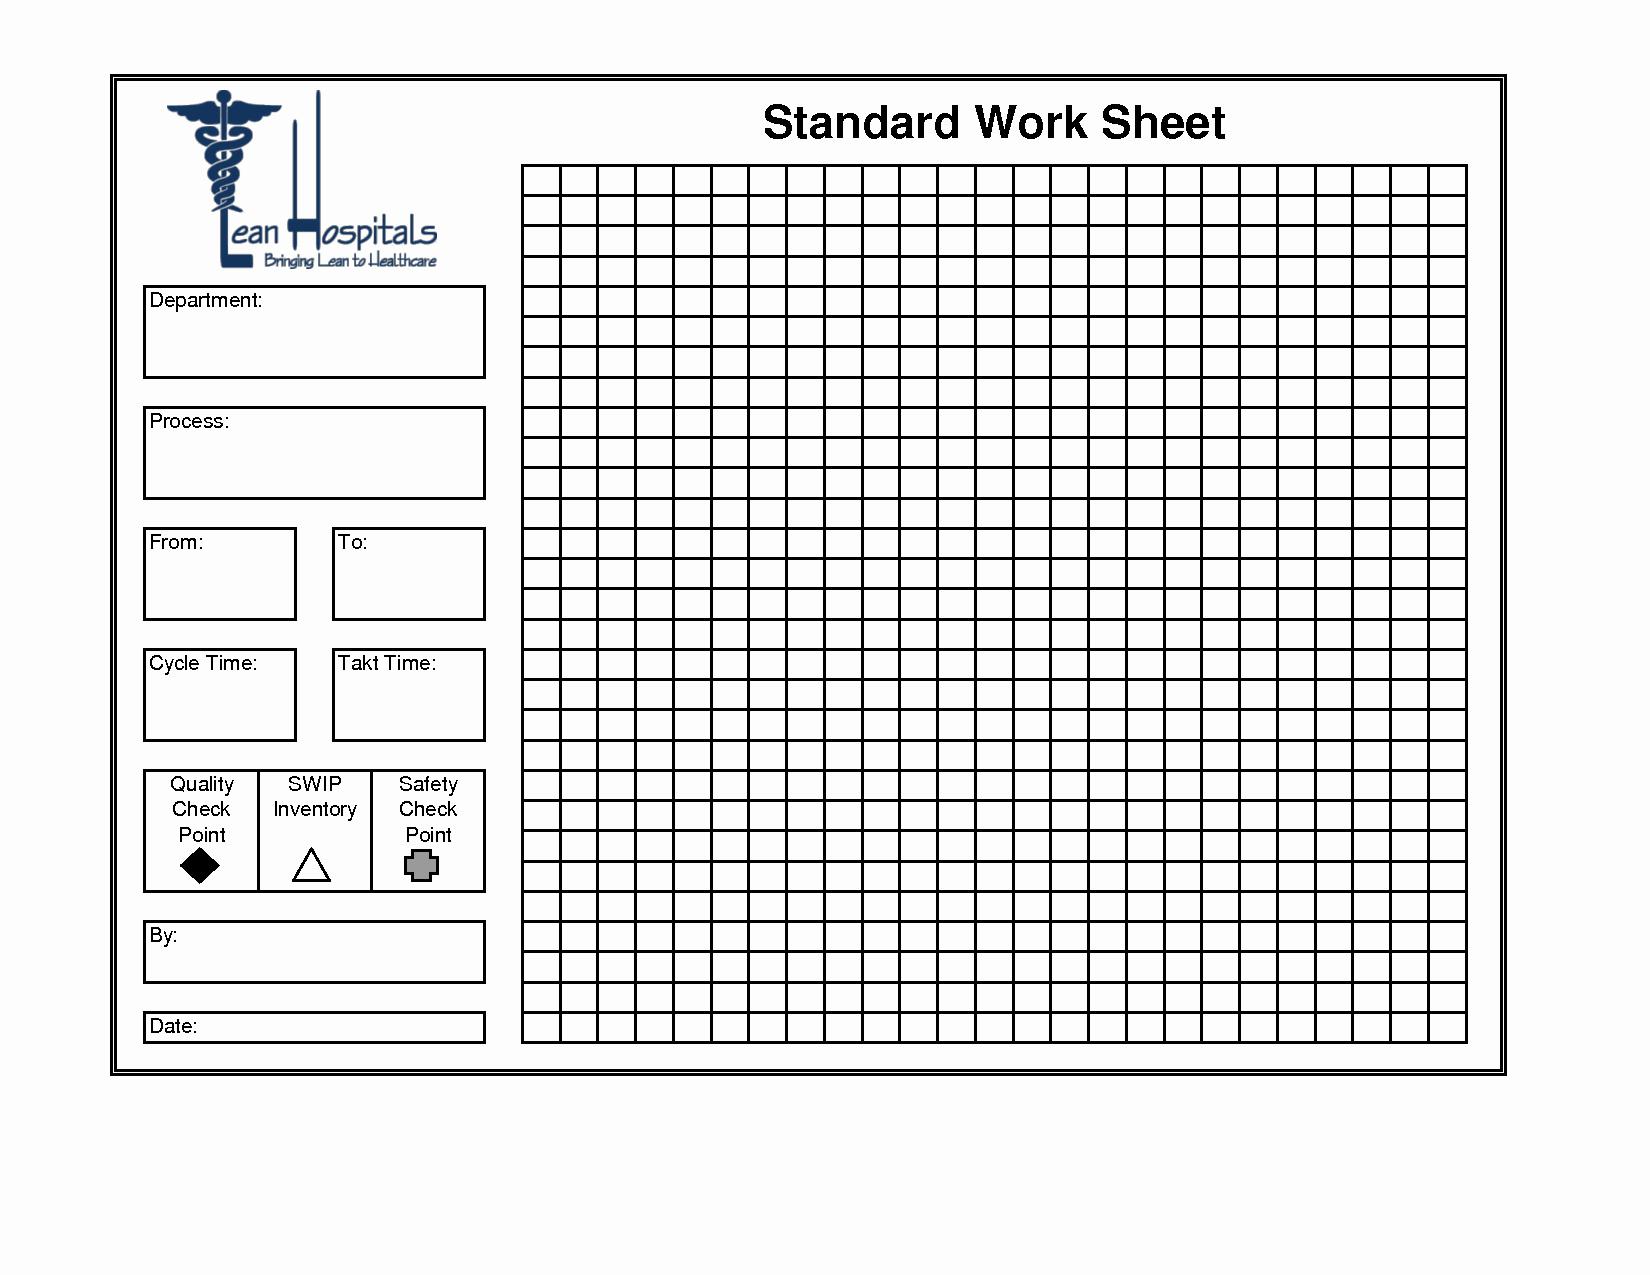 Standardized Work Templates Excel Fresh Best S Of Standard Work Excel Template Standard Work Bination Sheet Template Lean